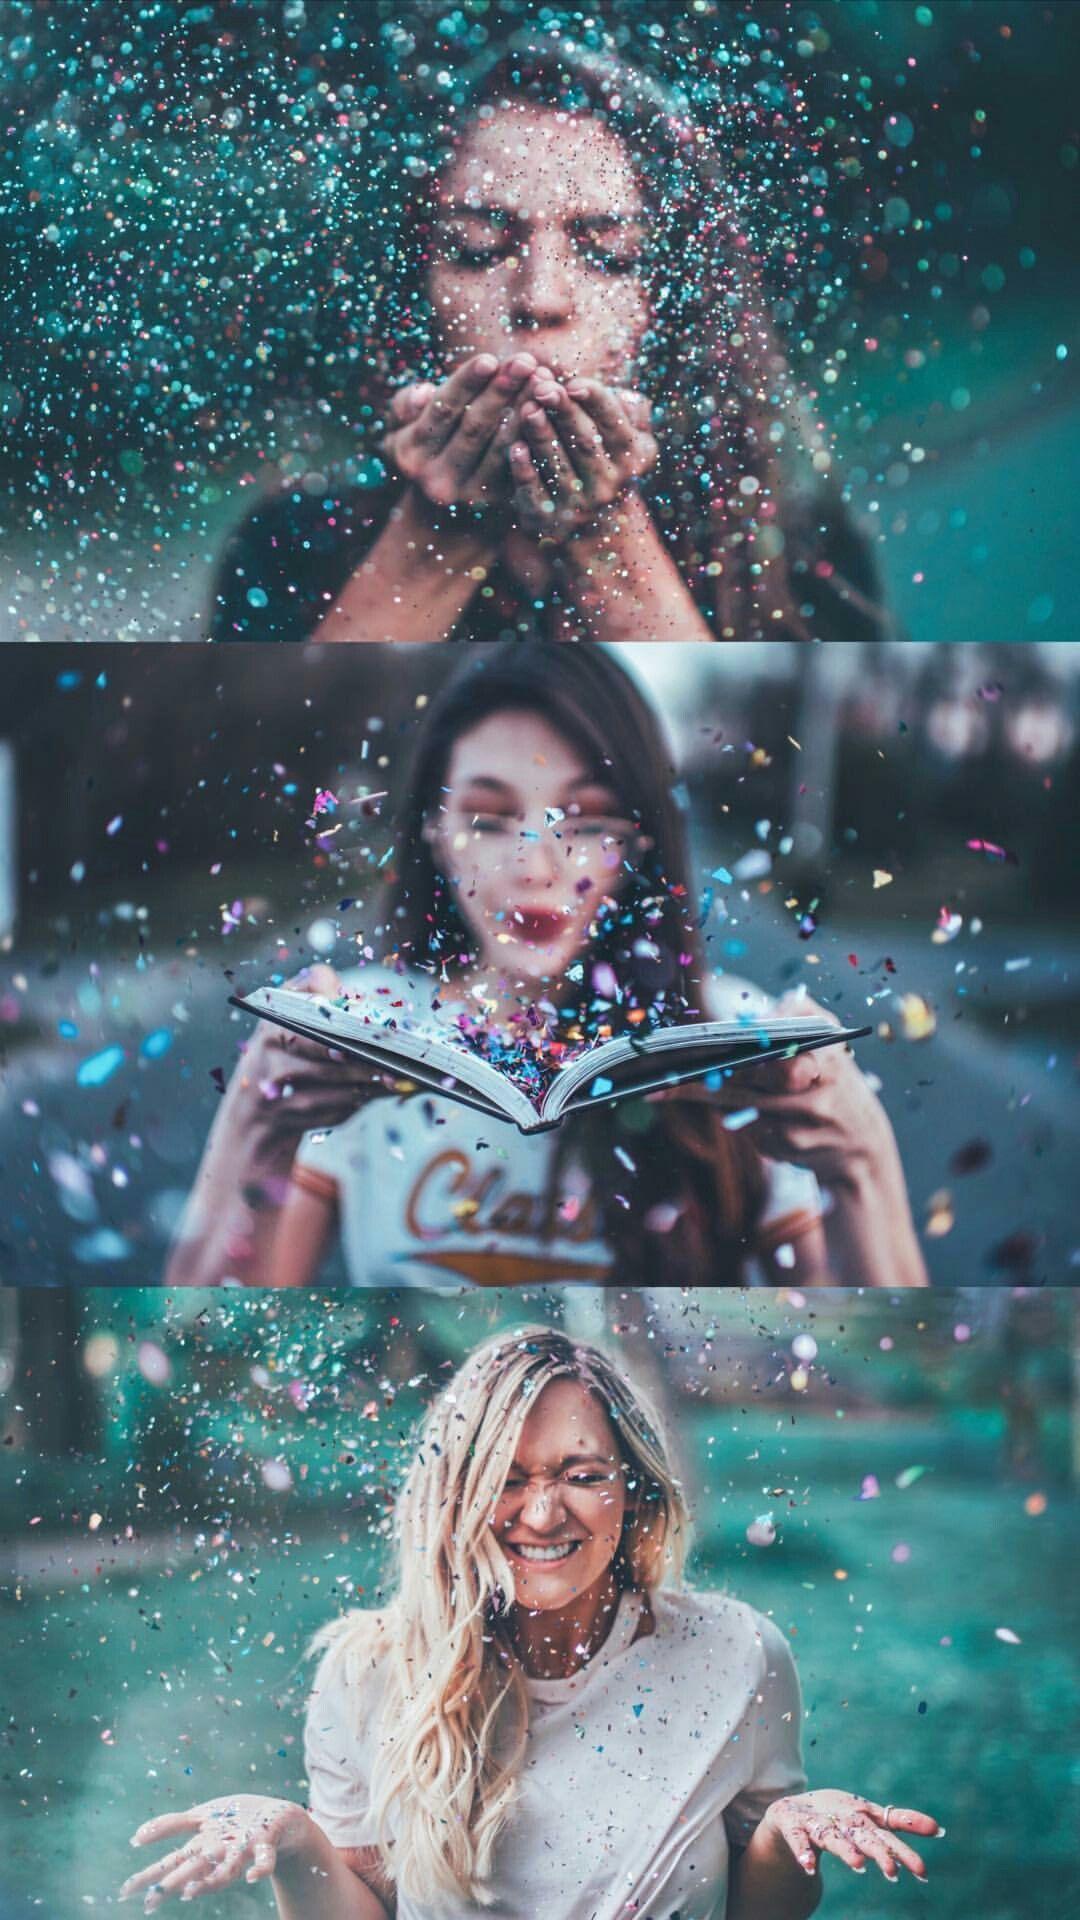 – future // art journal + poetry von noor unnahar // journaling ideas inspiration scrapbooking diy craft mixed media artsy, tumblr indie blasse grunge…